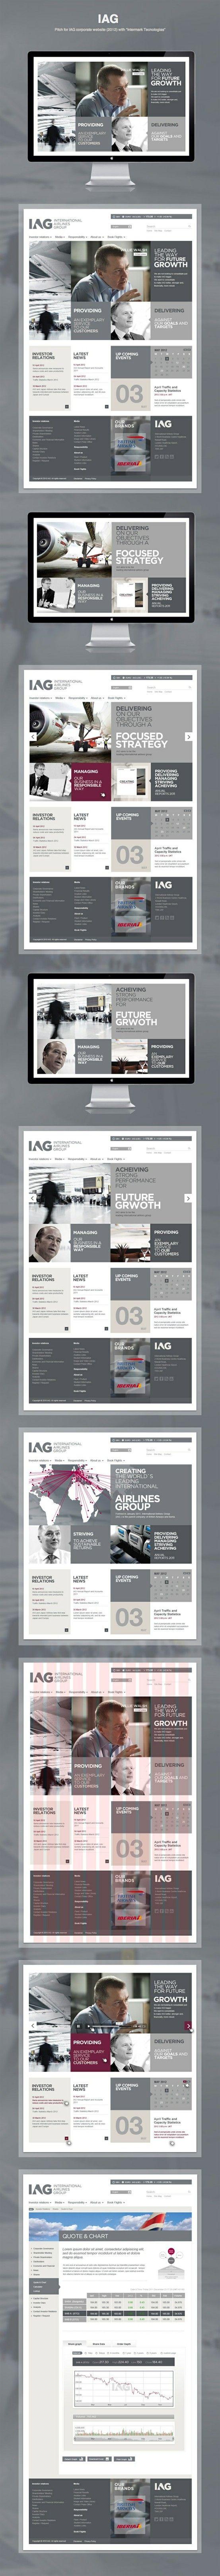 IAG - International Airlines Group | http://www.iairgroup.com | #Webdesign